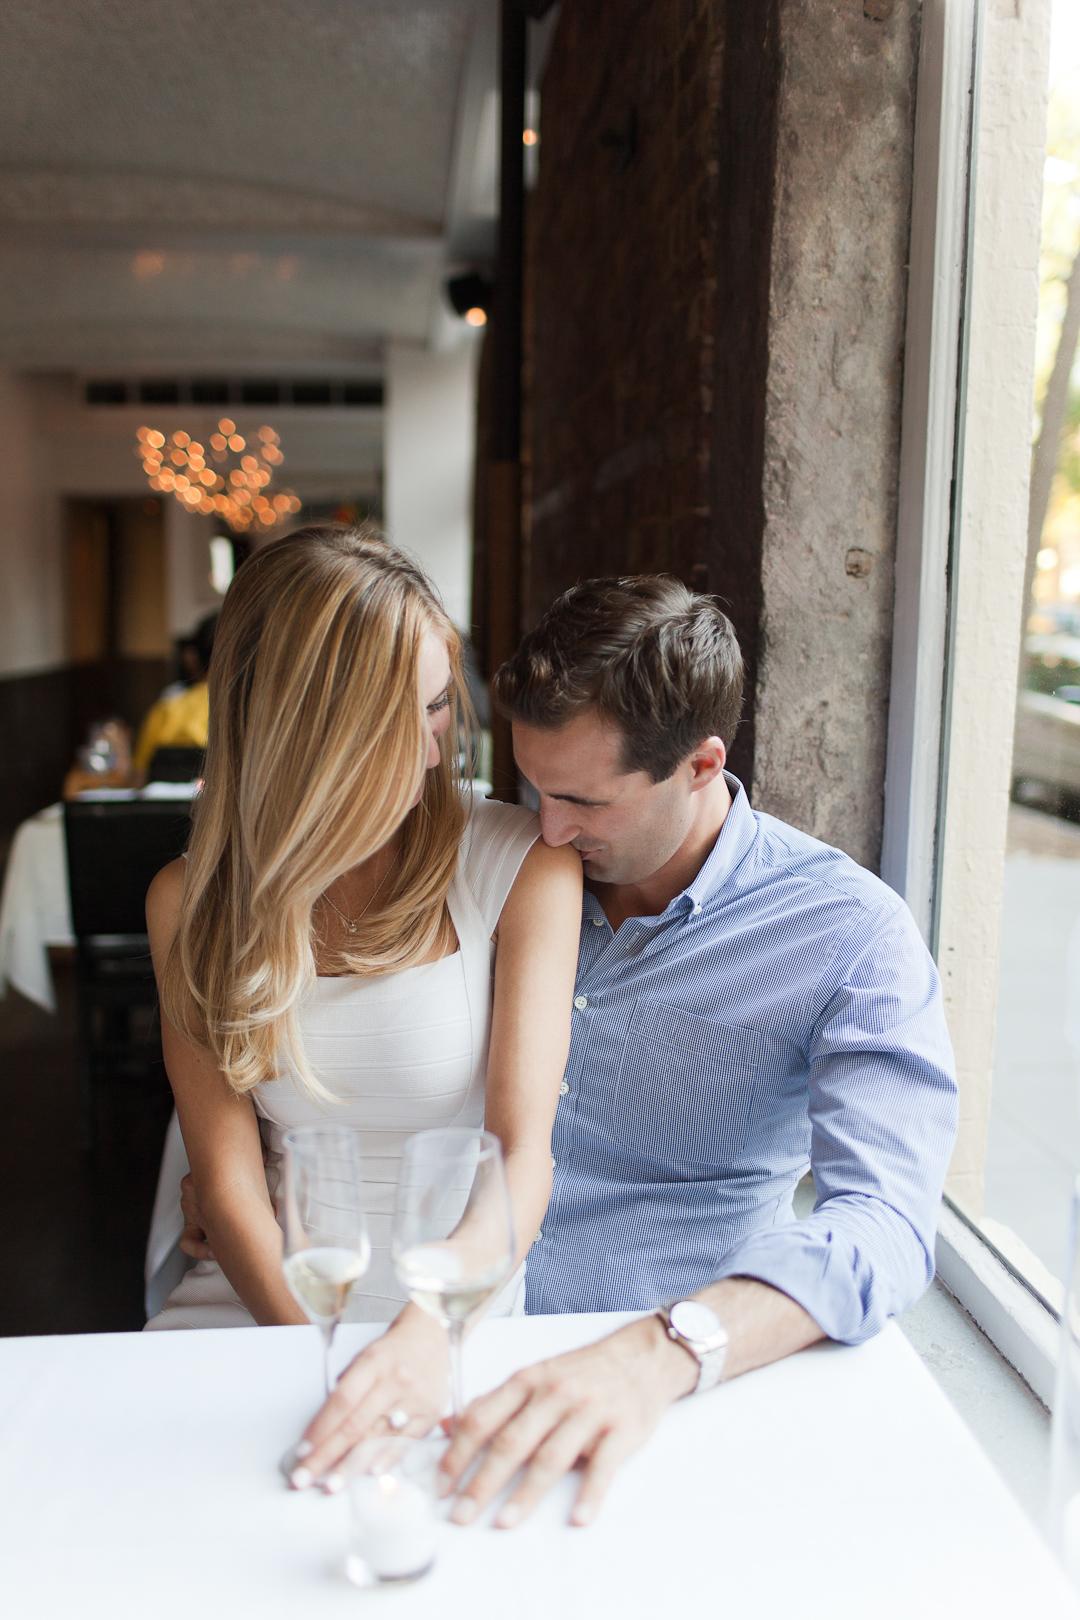 Melissa Kruse Photography - Daniece & Chris West Village Engagement Photos-32.jpg